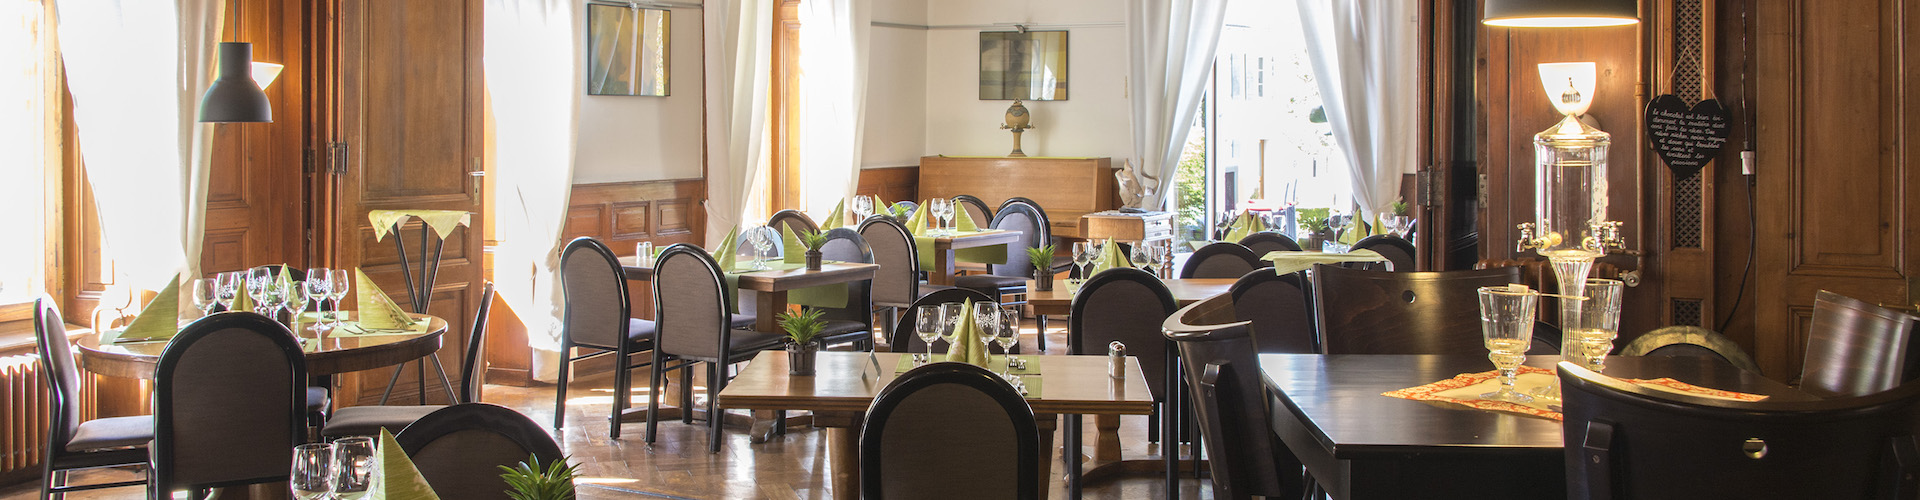 Restaurant de l'Aigle